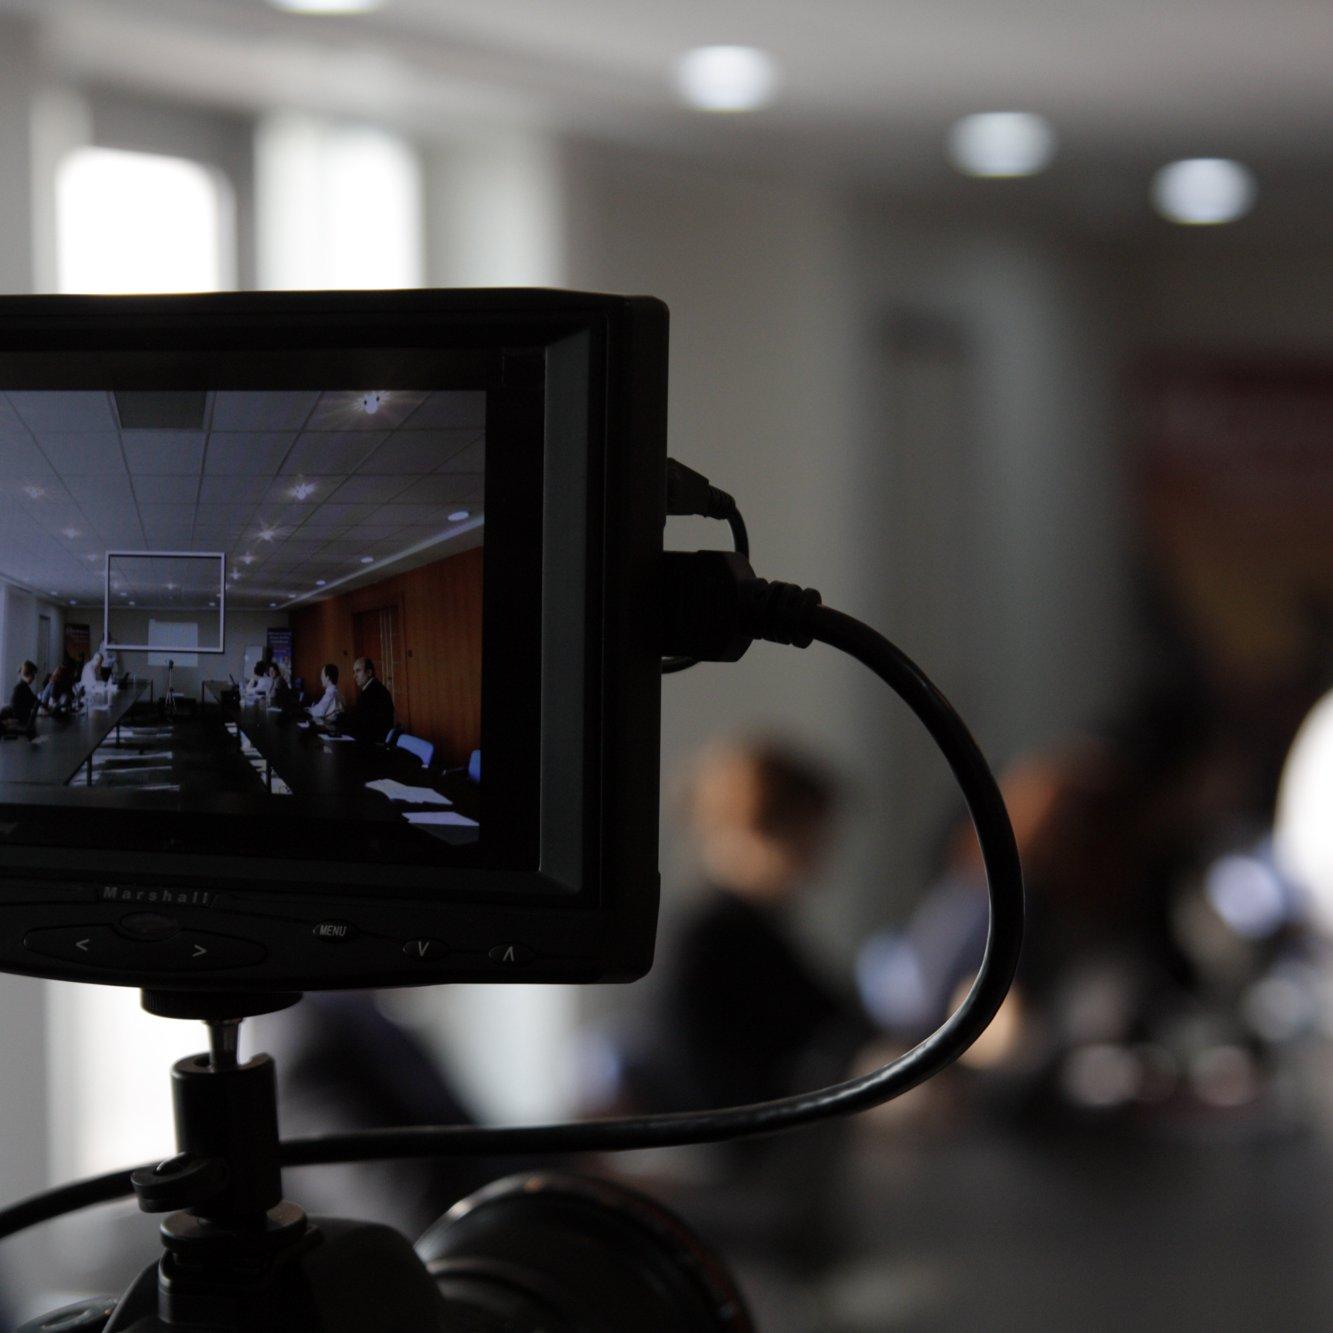 tanitim-filmi-manas-medya-produksyon-reklam-ajansi tanıtım filmi